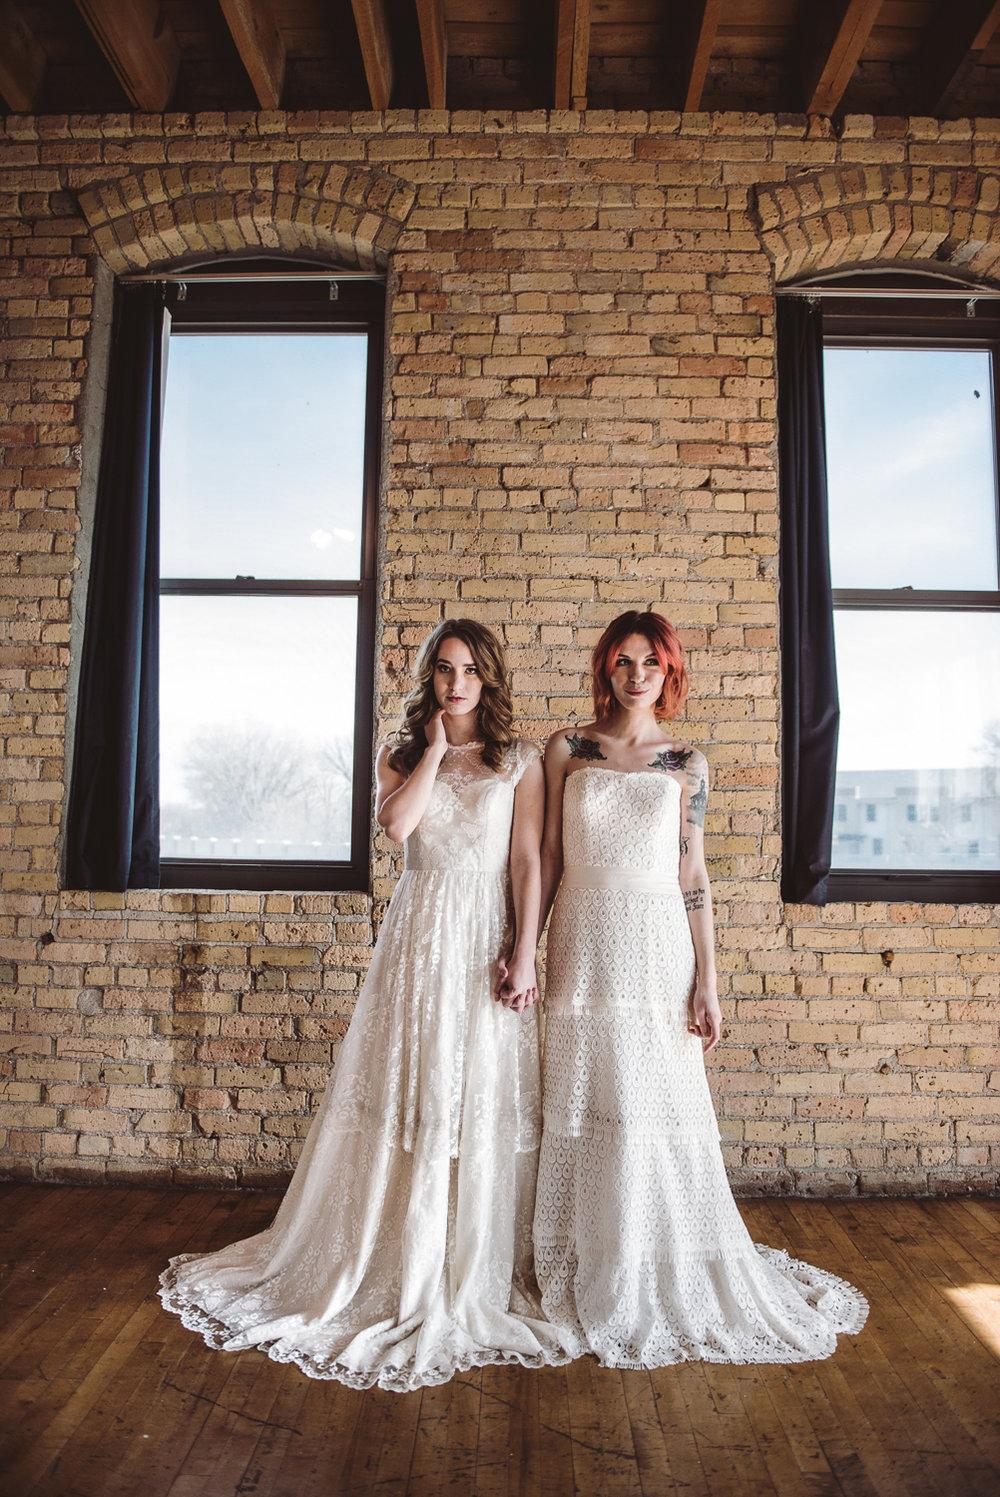 RKH Images - Best of 2016 - Minnesota Wedding Photographer -1.jpg